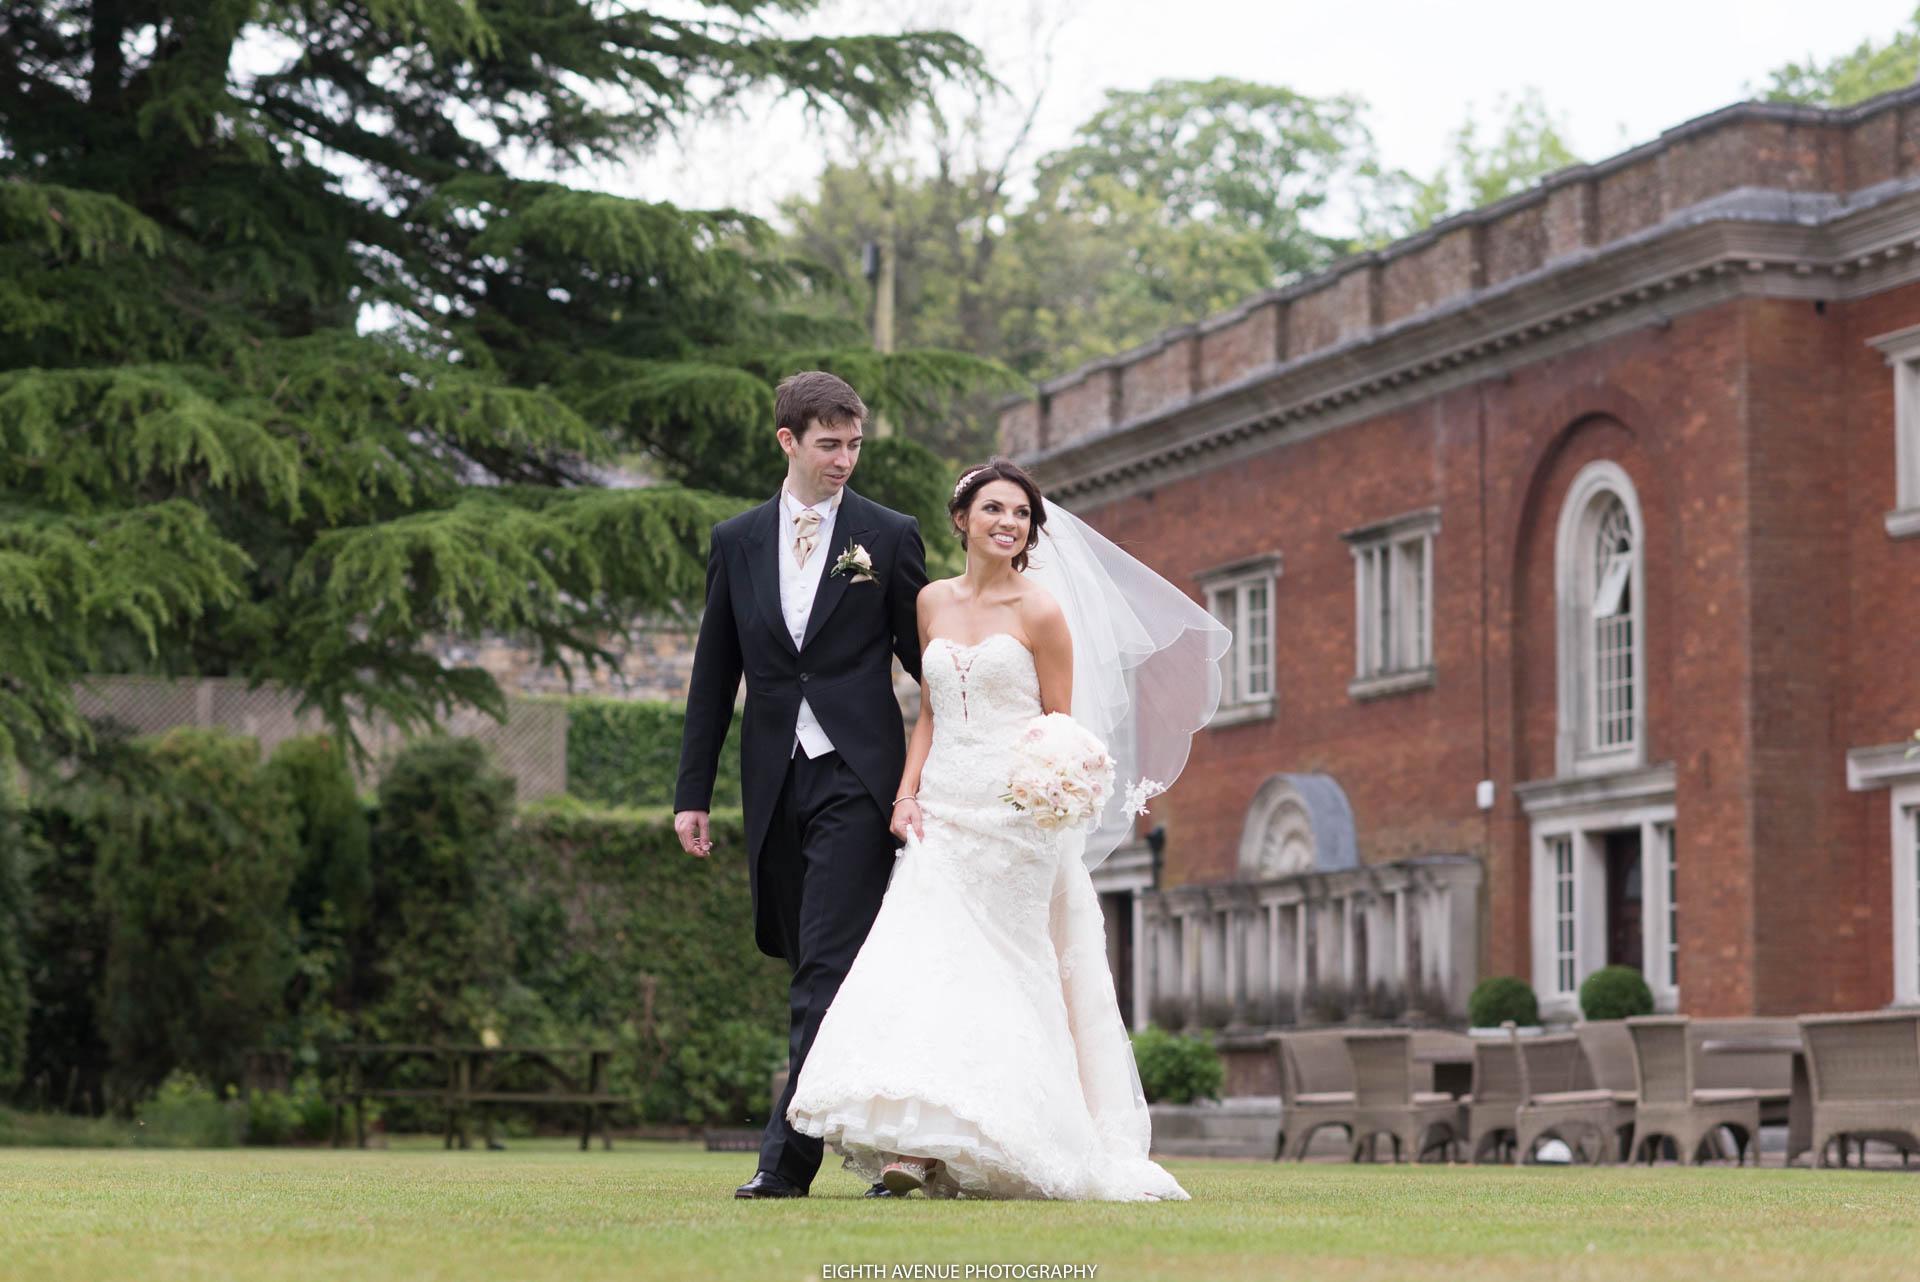 Bride and grooms walking across lawn